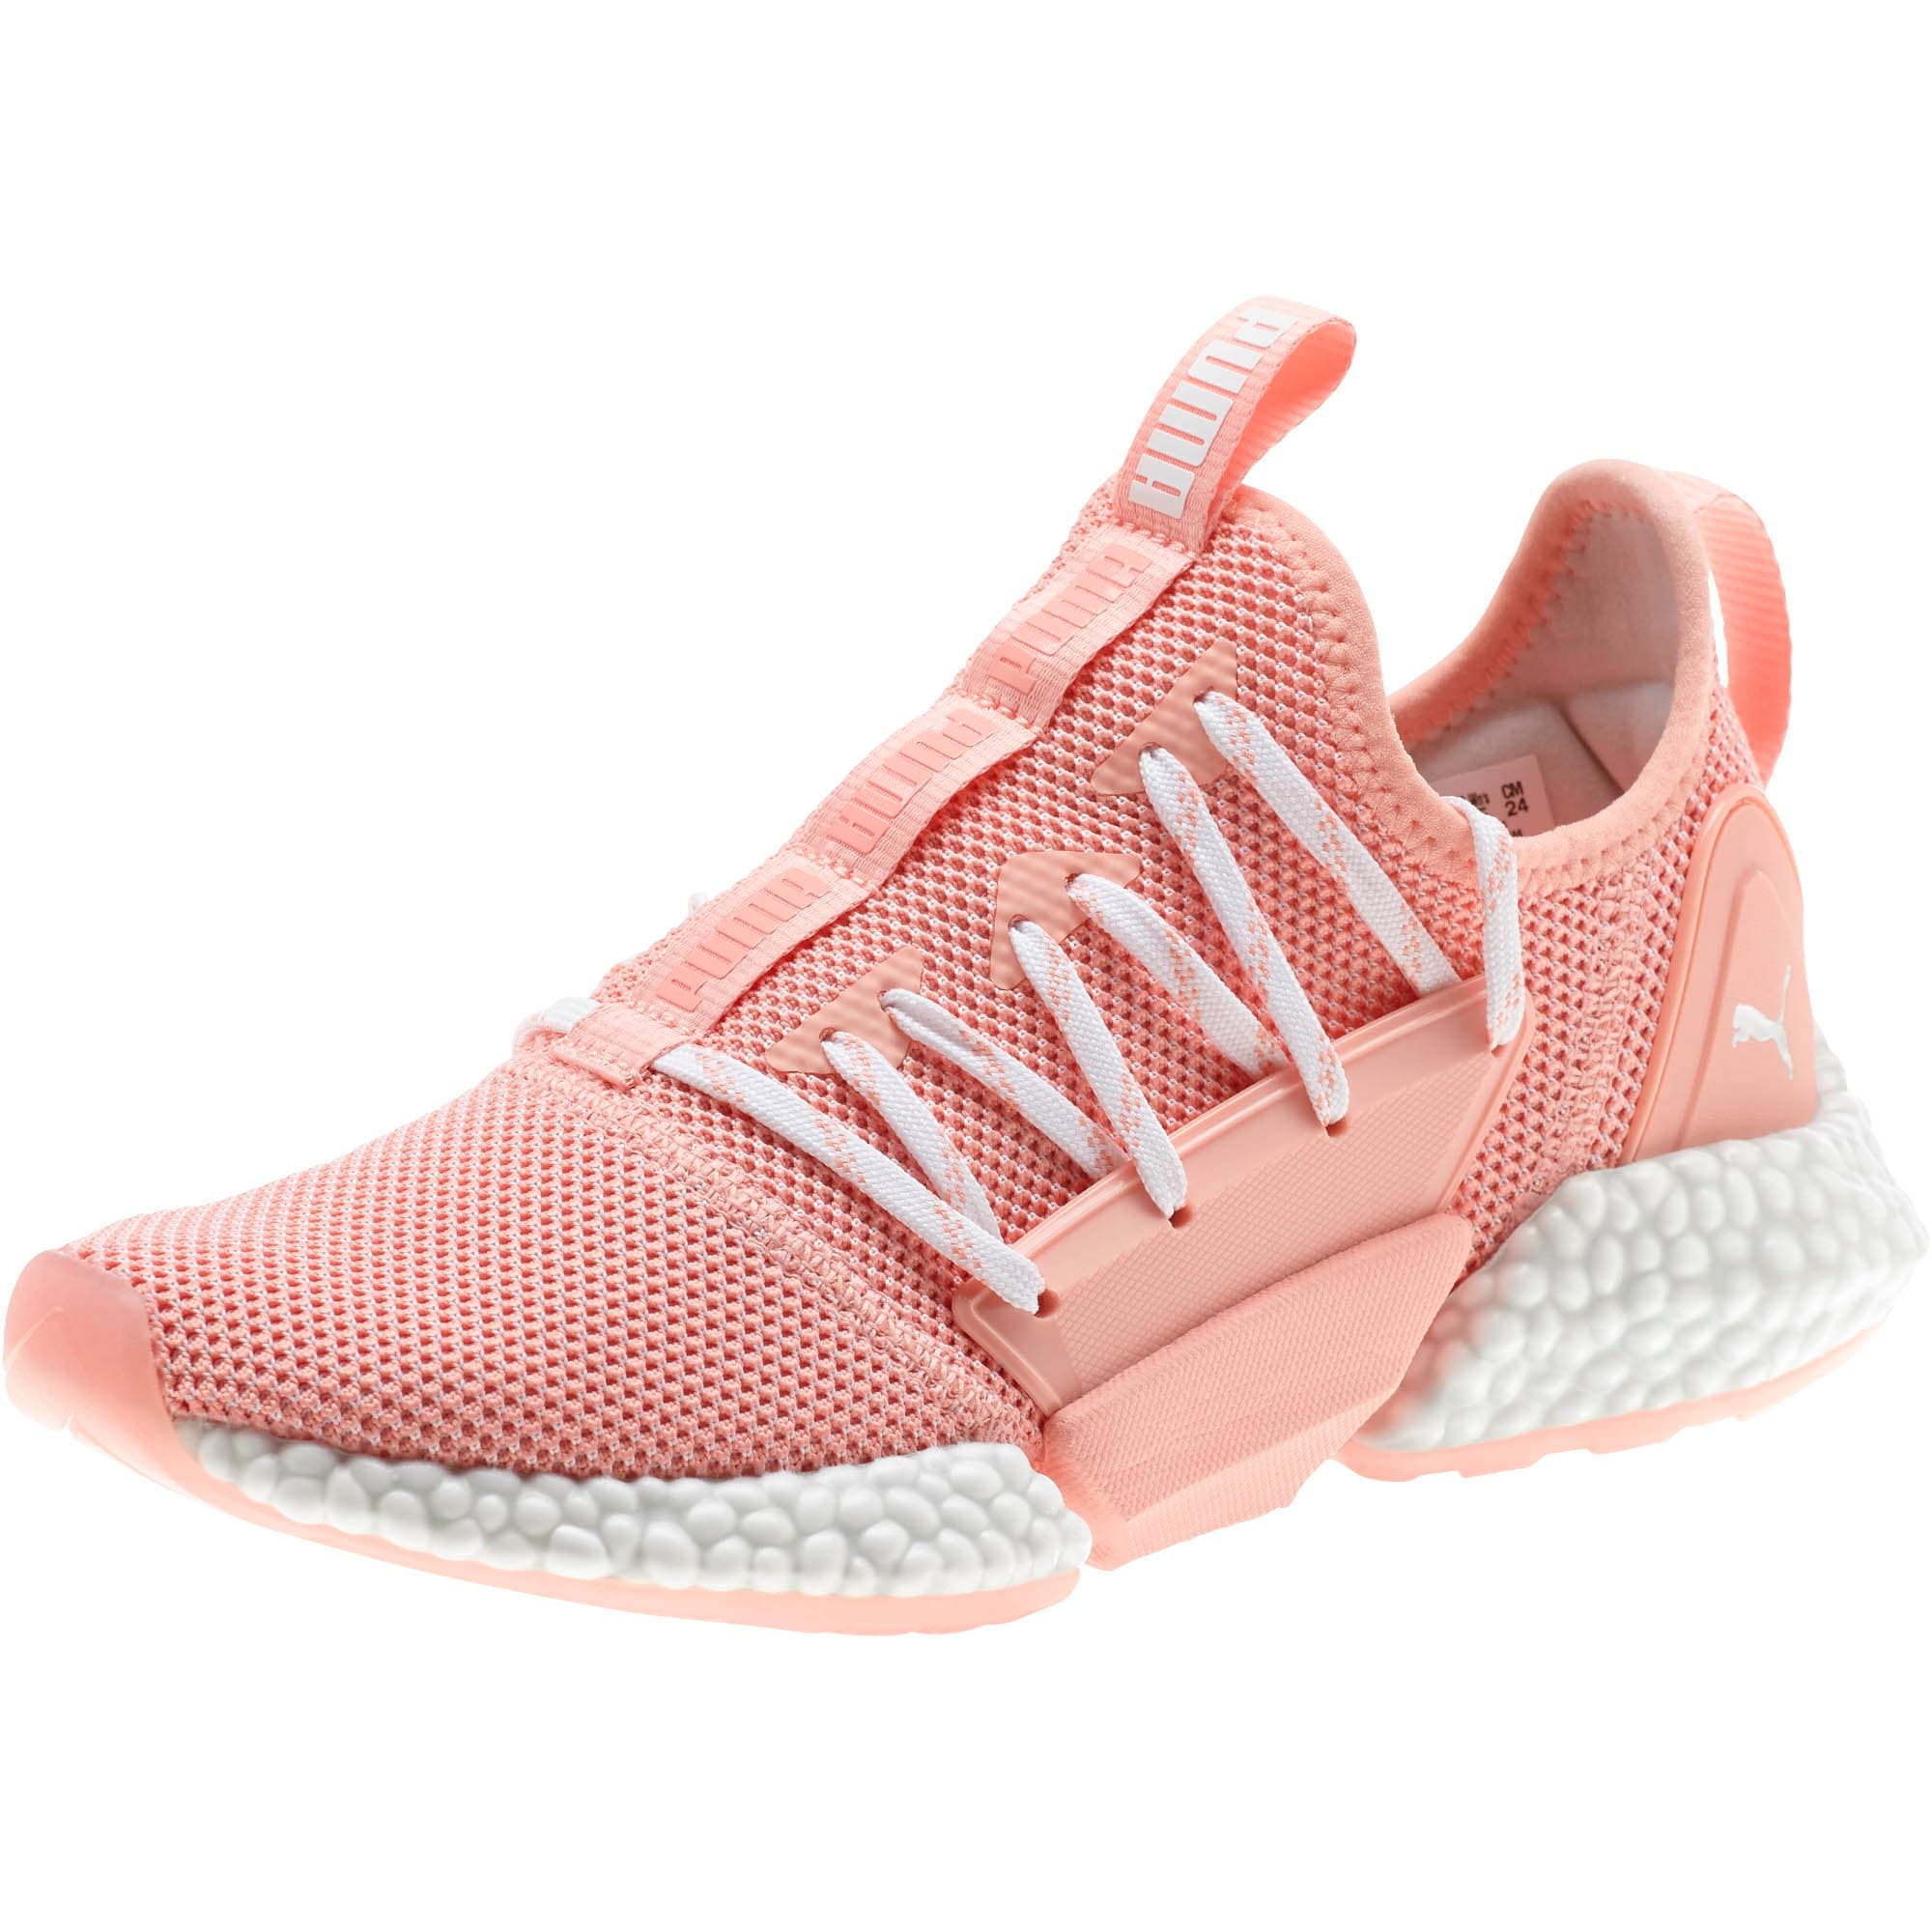 Miniatura 1 de Zapatos para correr HYBRID Rocket Runner para mujer, Peach Bud-Puma White, mediano